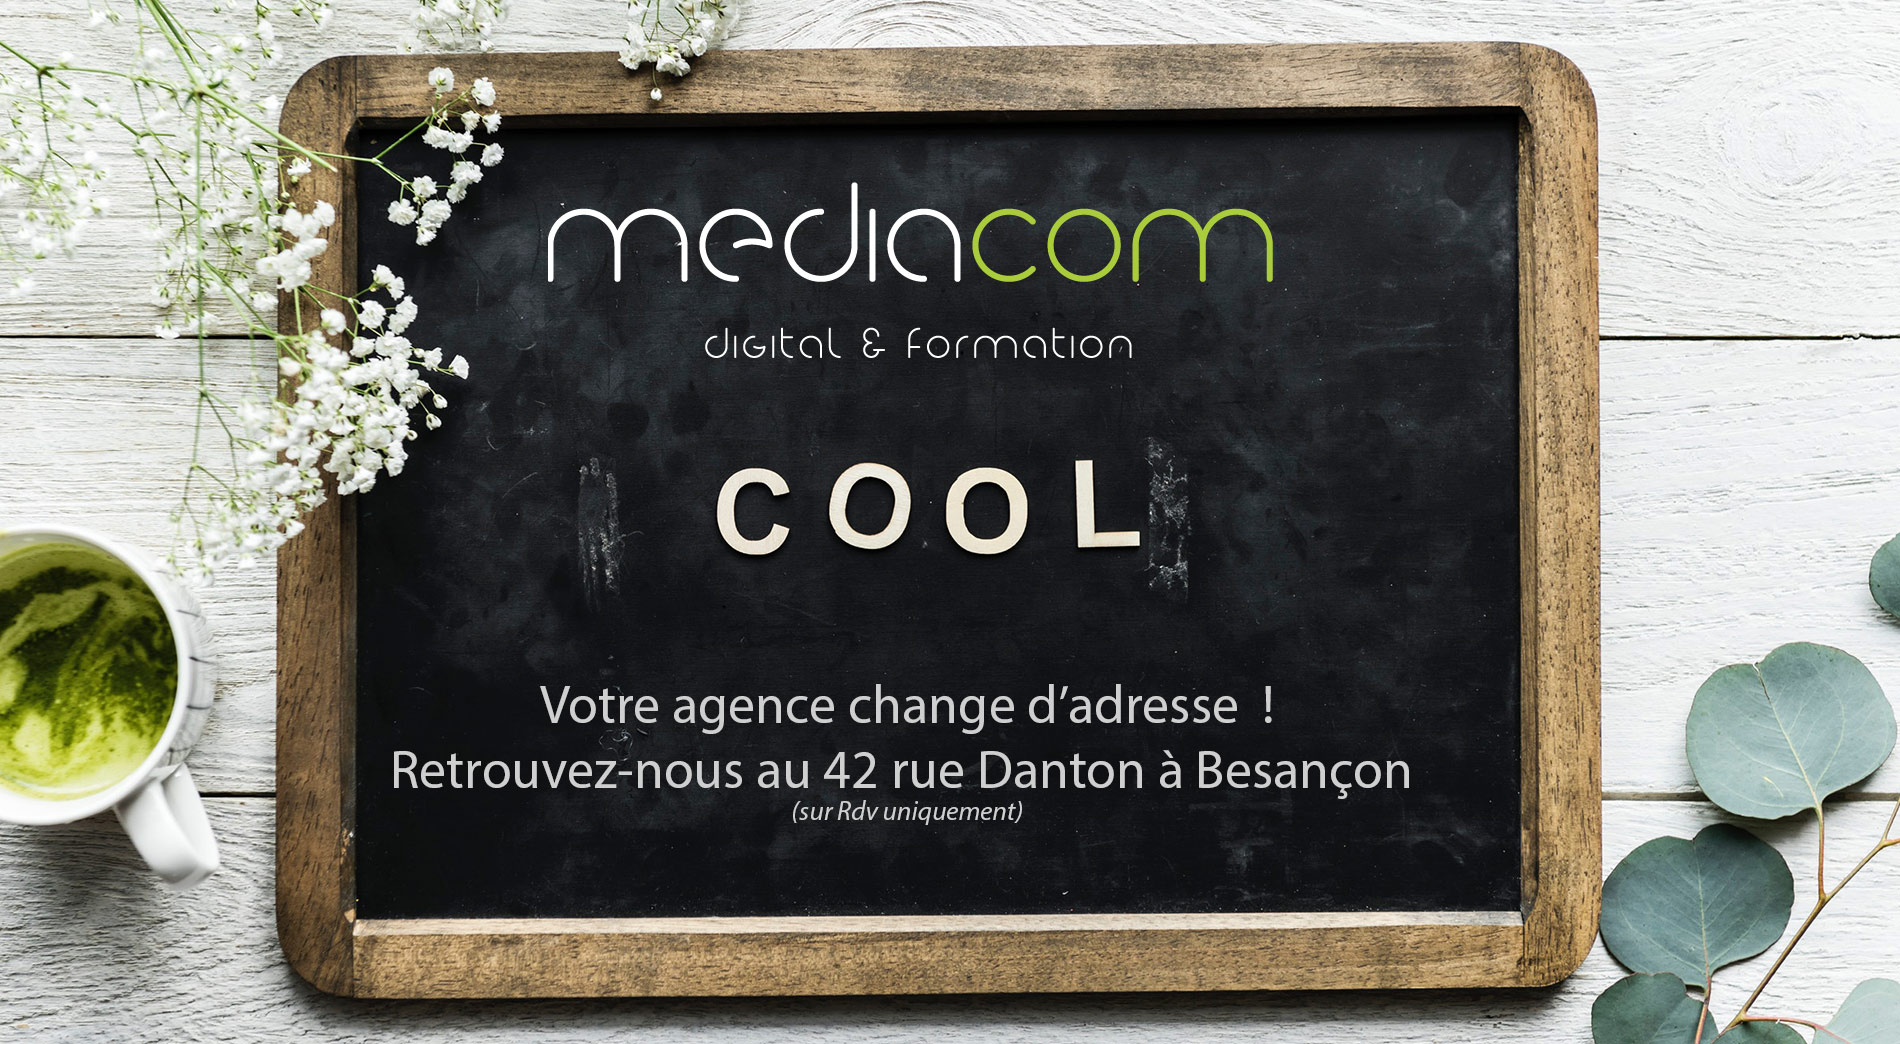 mediacom changement d adresse besancon